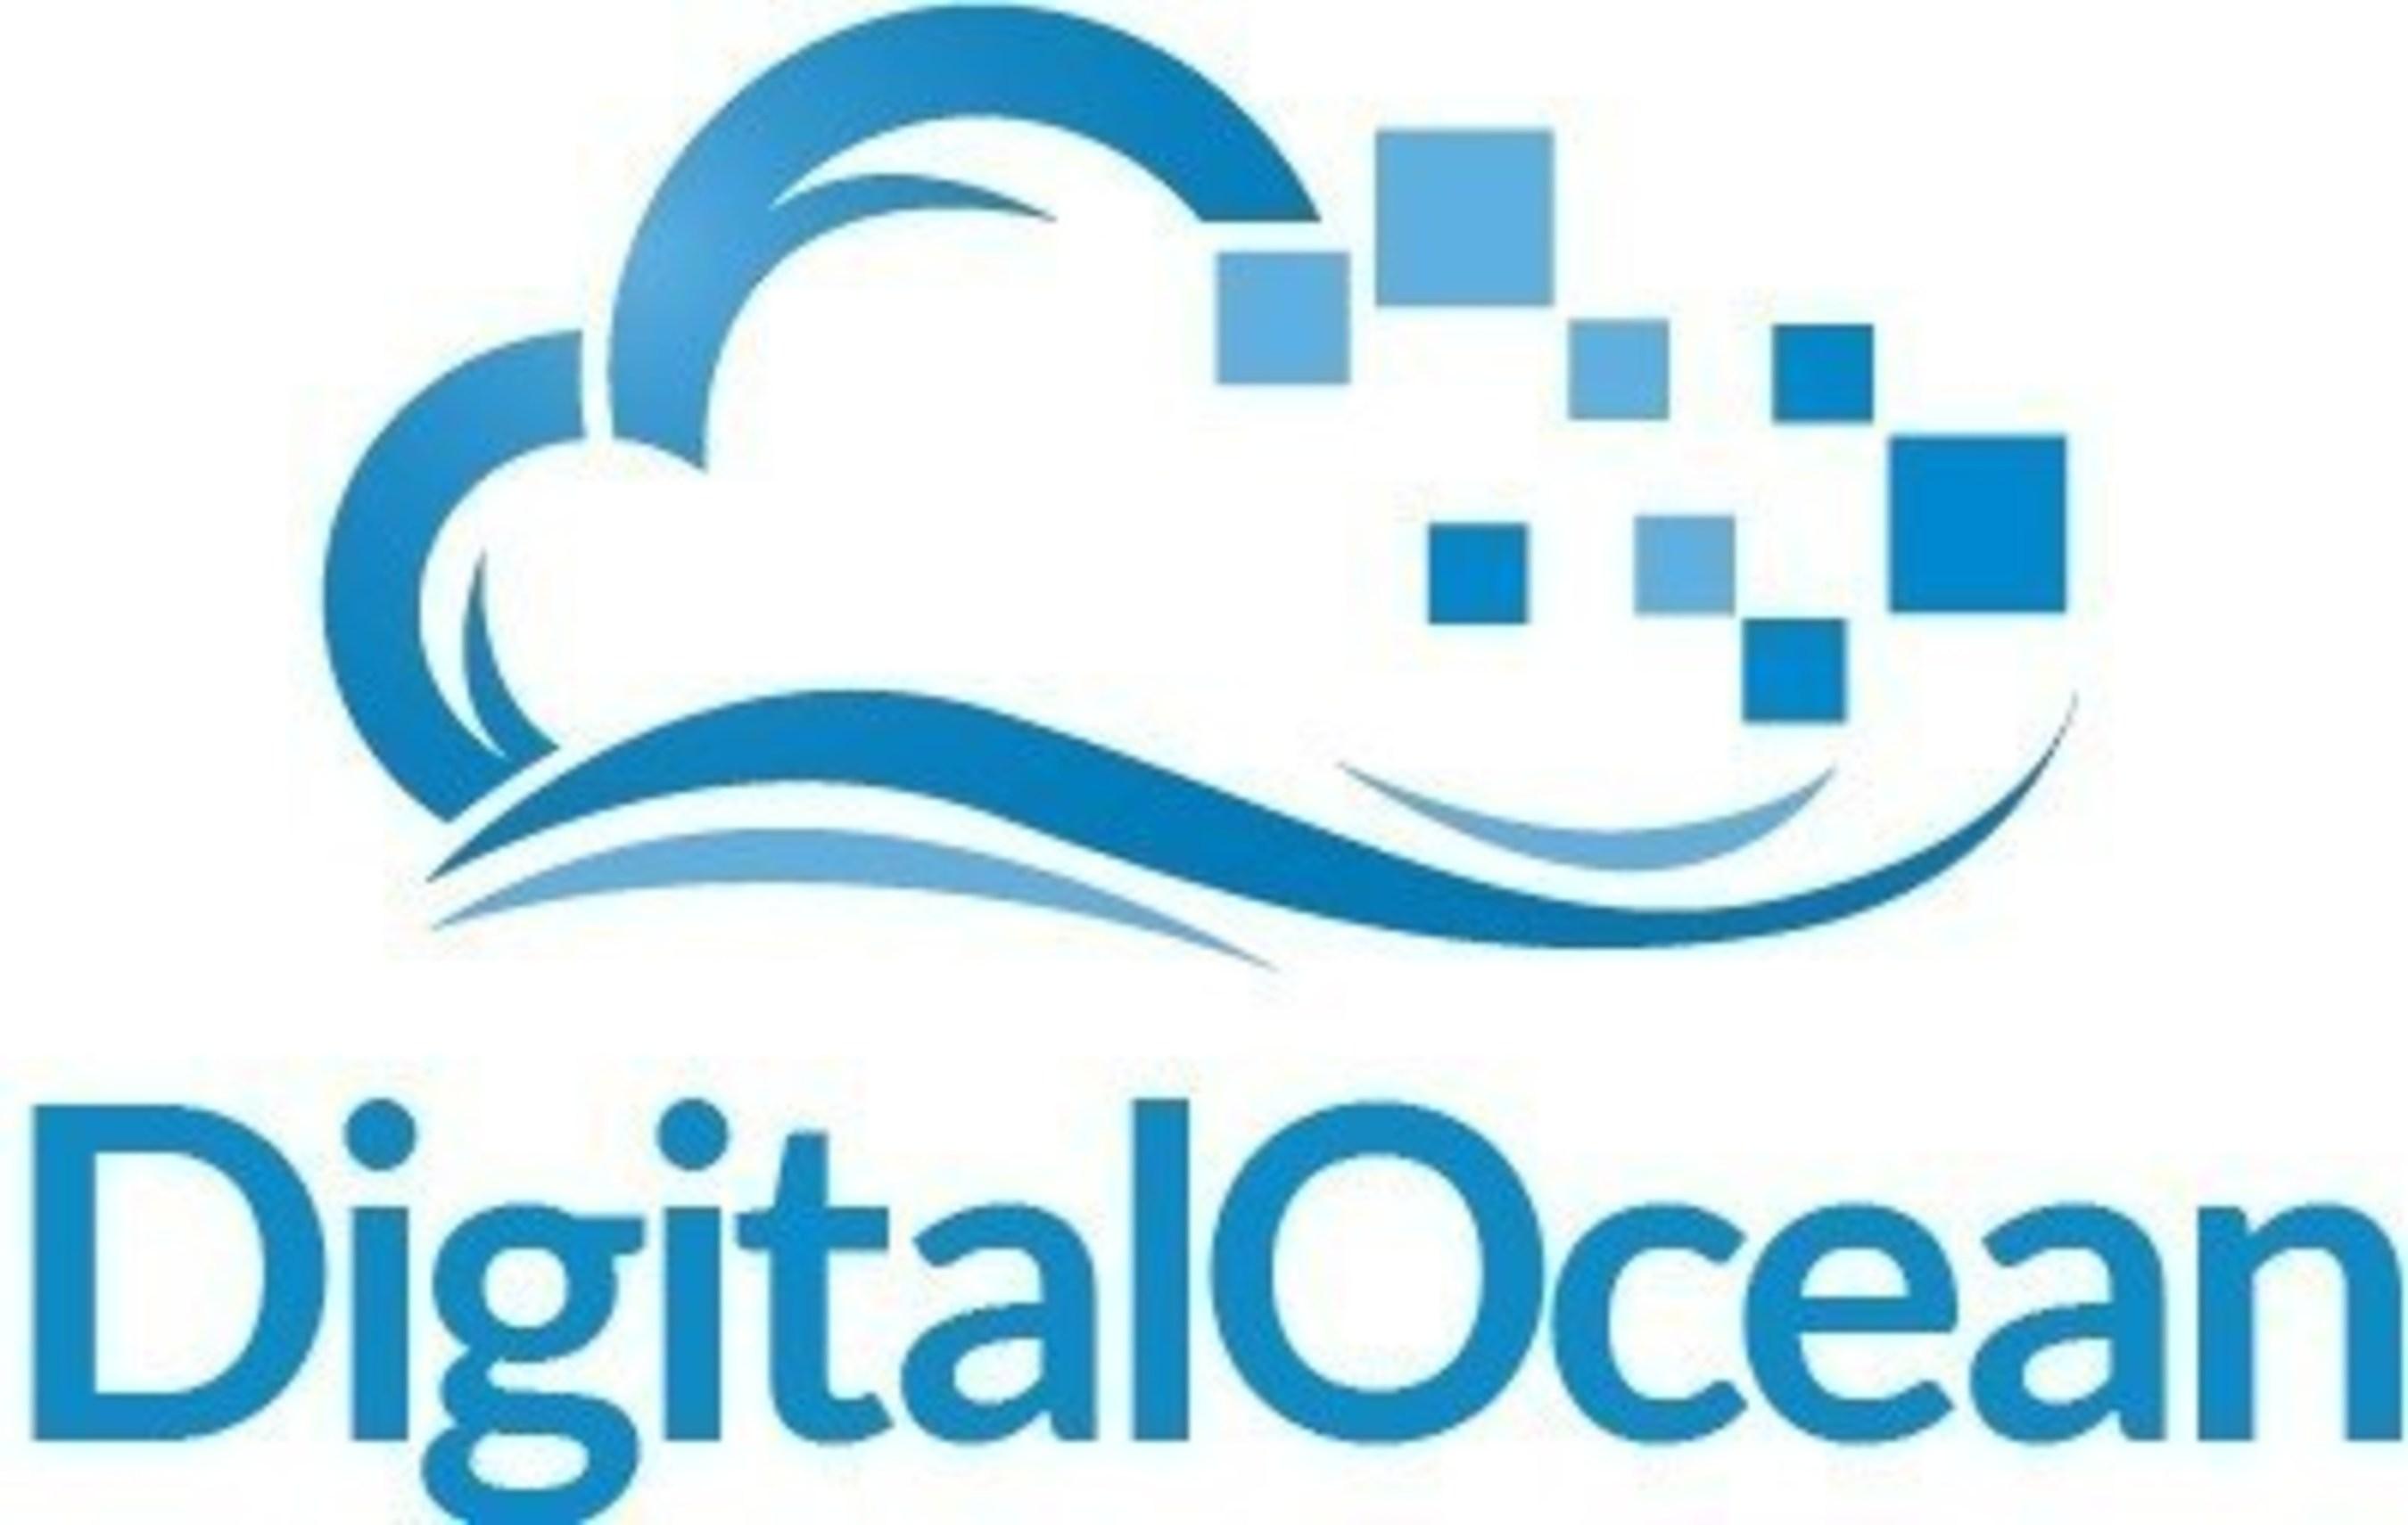 DigitalOcean Secures $130 Million Credit Facility to Build Next Generation Cloud